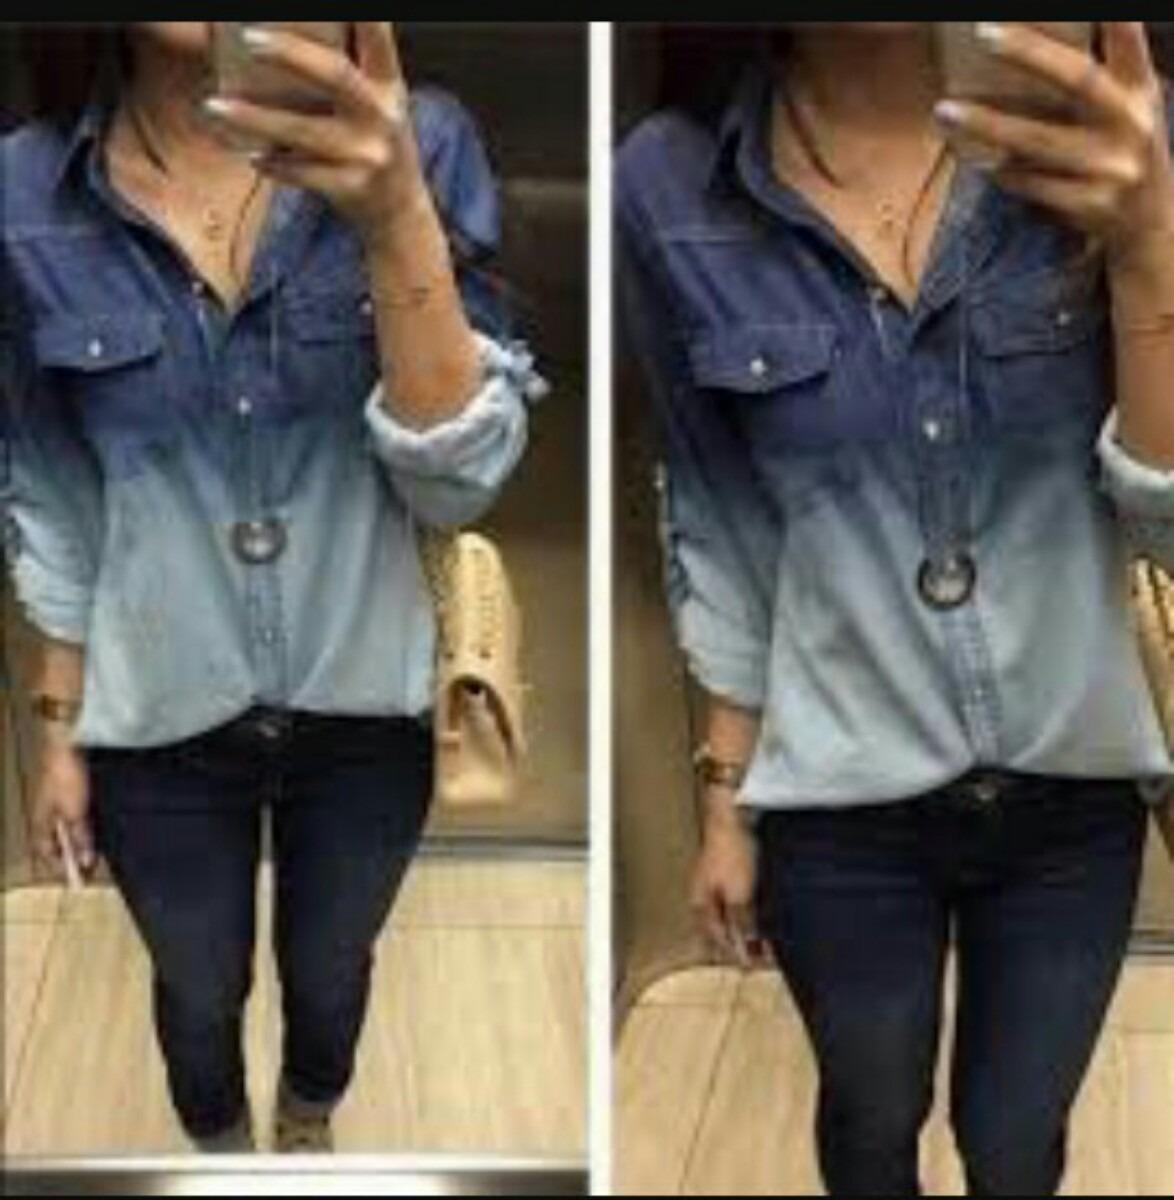 ecd357feeb camisa jeans feminino degrade duas cores. Carregando zoom.